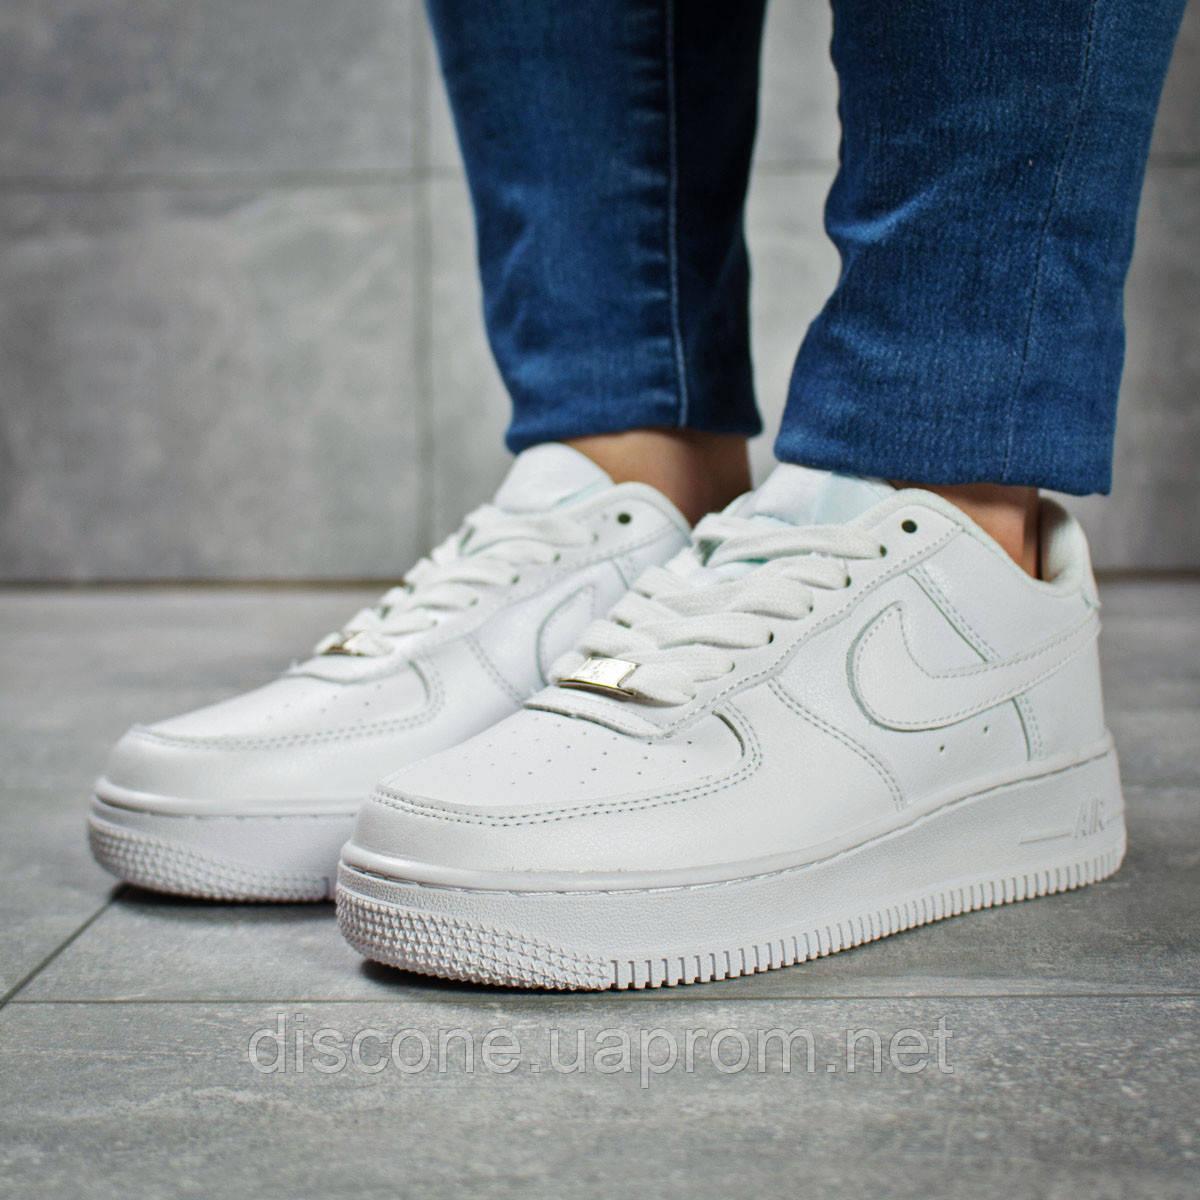 Кроссовки женские ► Nike Air,  белые (Код: 15802) ►(нет на складе) П Р О Д А Н О!